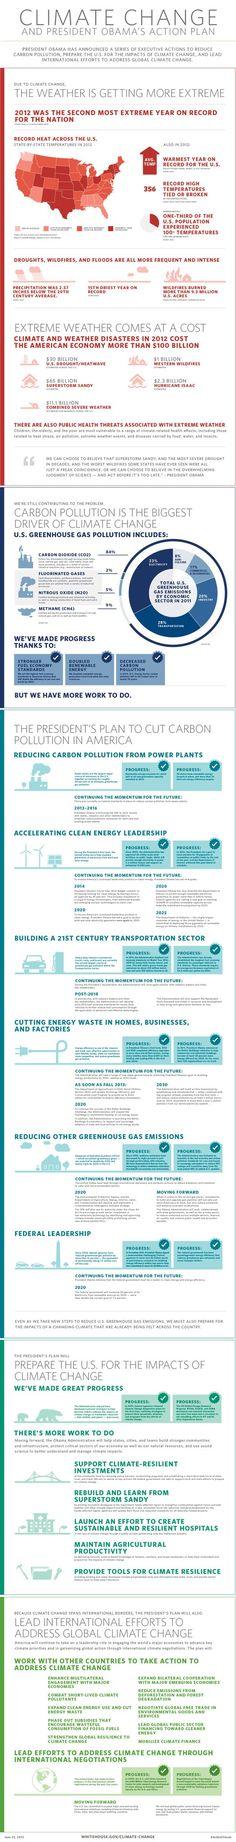 President Obama's Climate Change Plan (Infographic) : TreeHugger